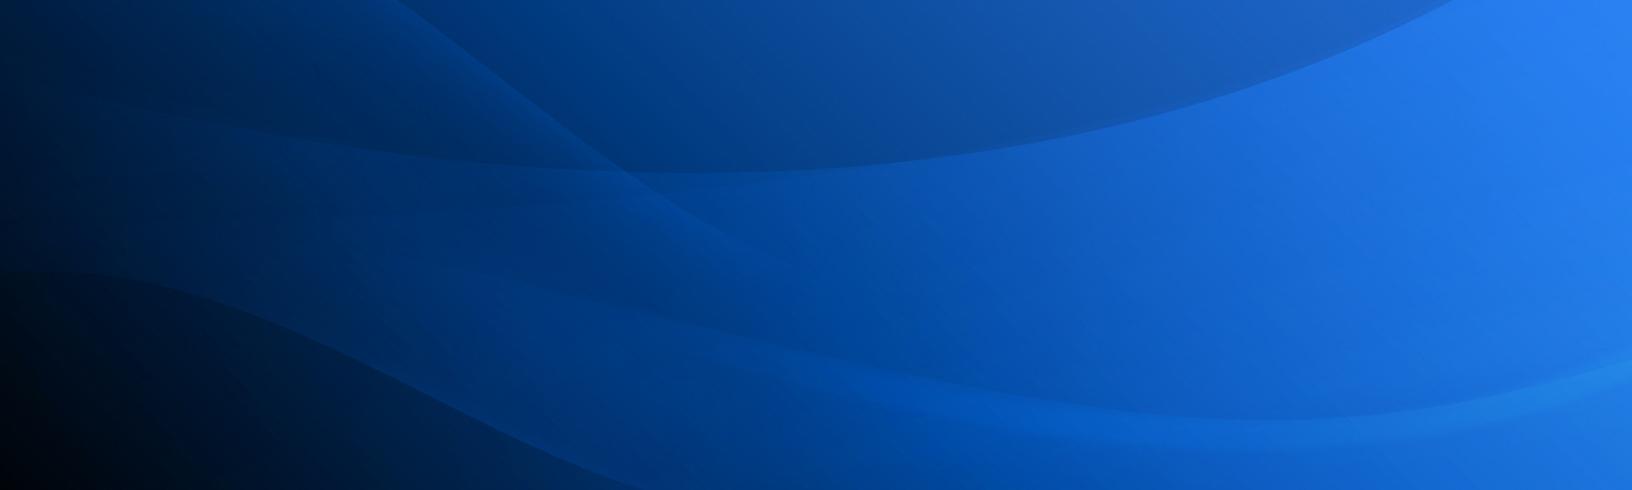 Voice-Alexa-Banner-Image-1